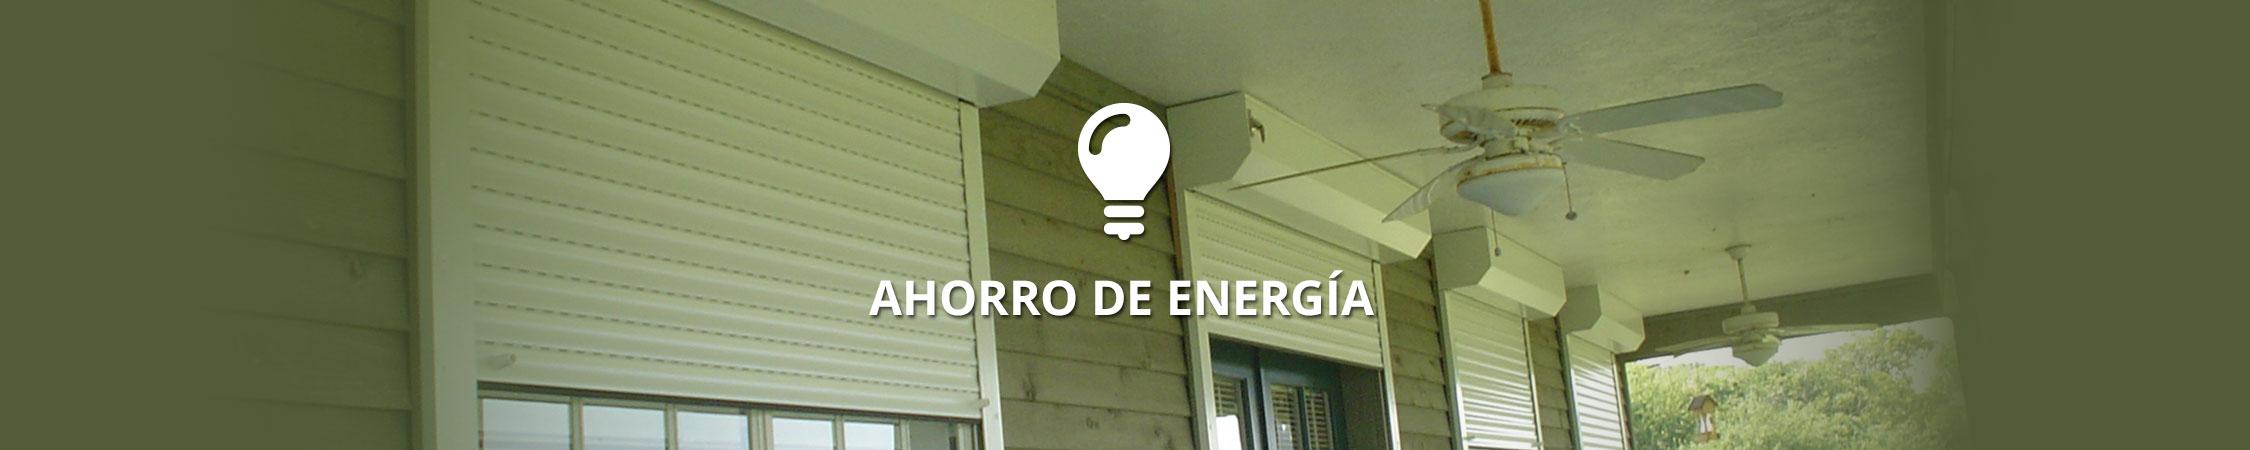 Ahorro de Energia - Rolltex Shutters